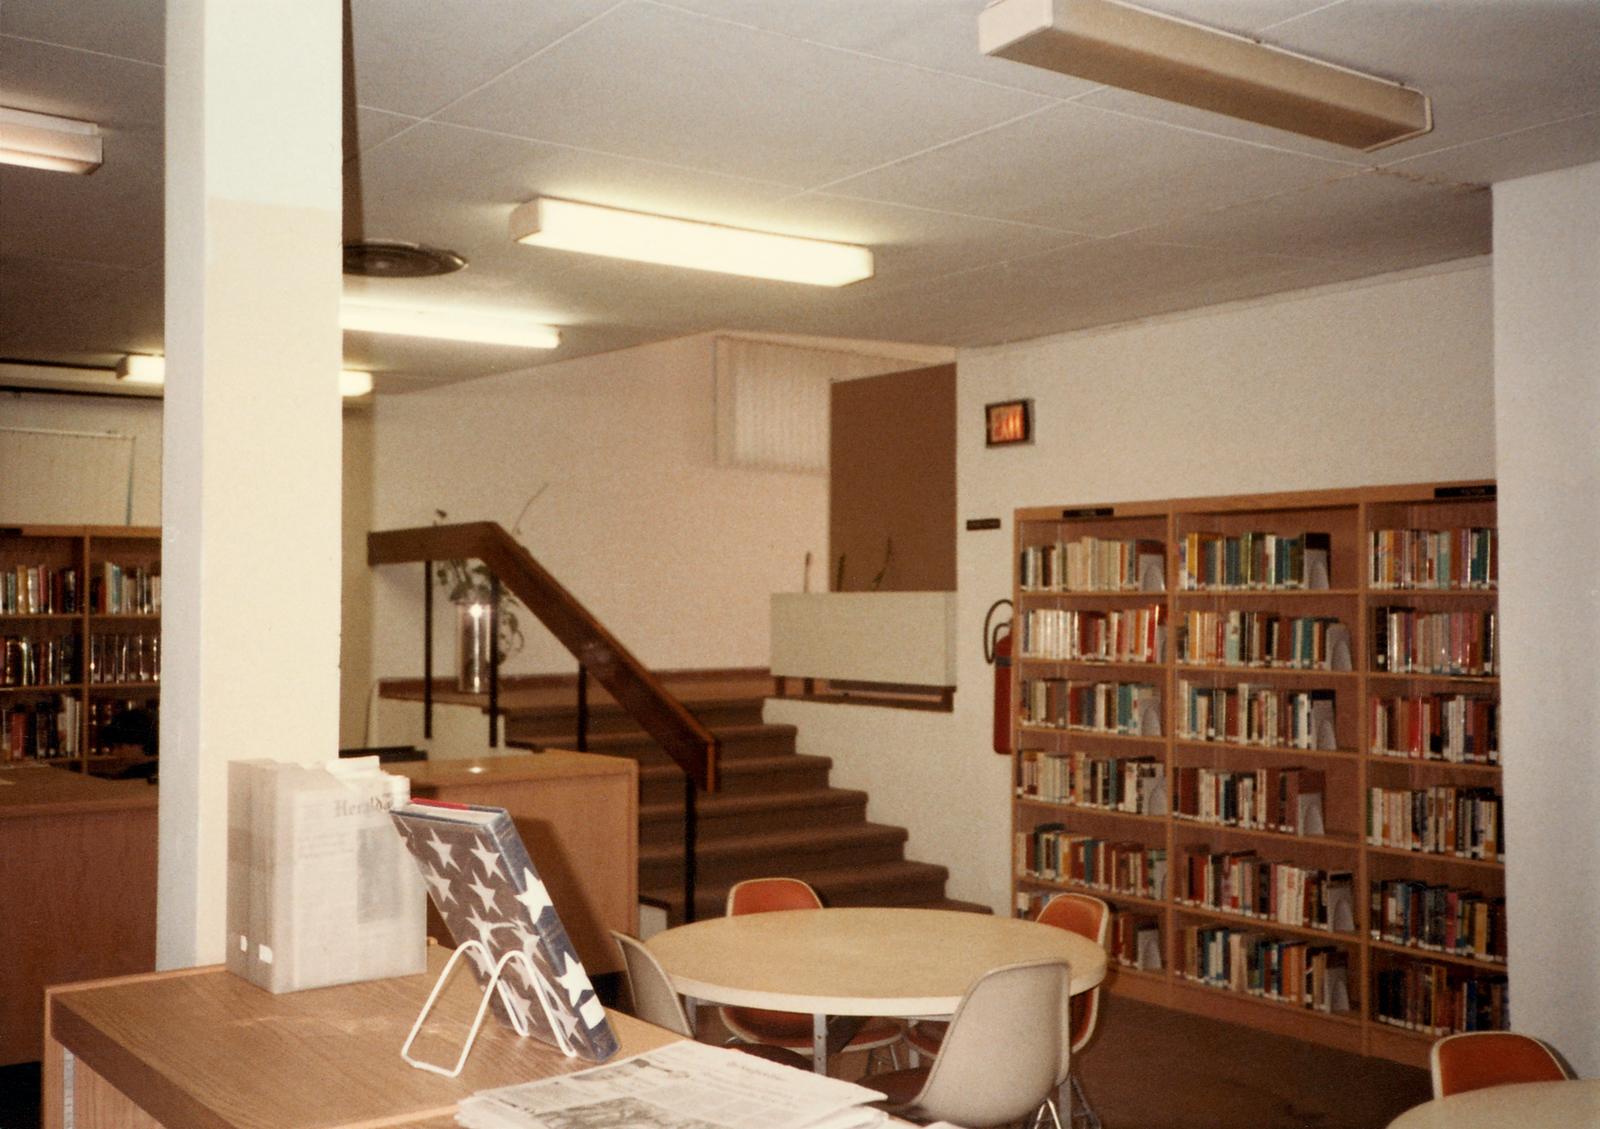 Libreville - Annex Office Building - 1983